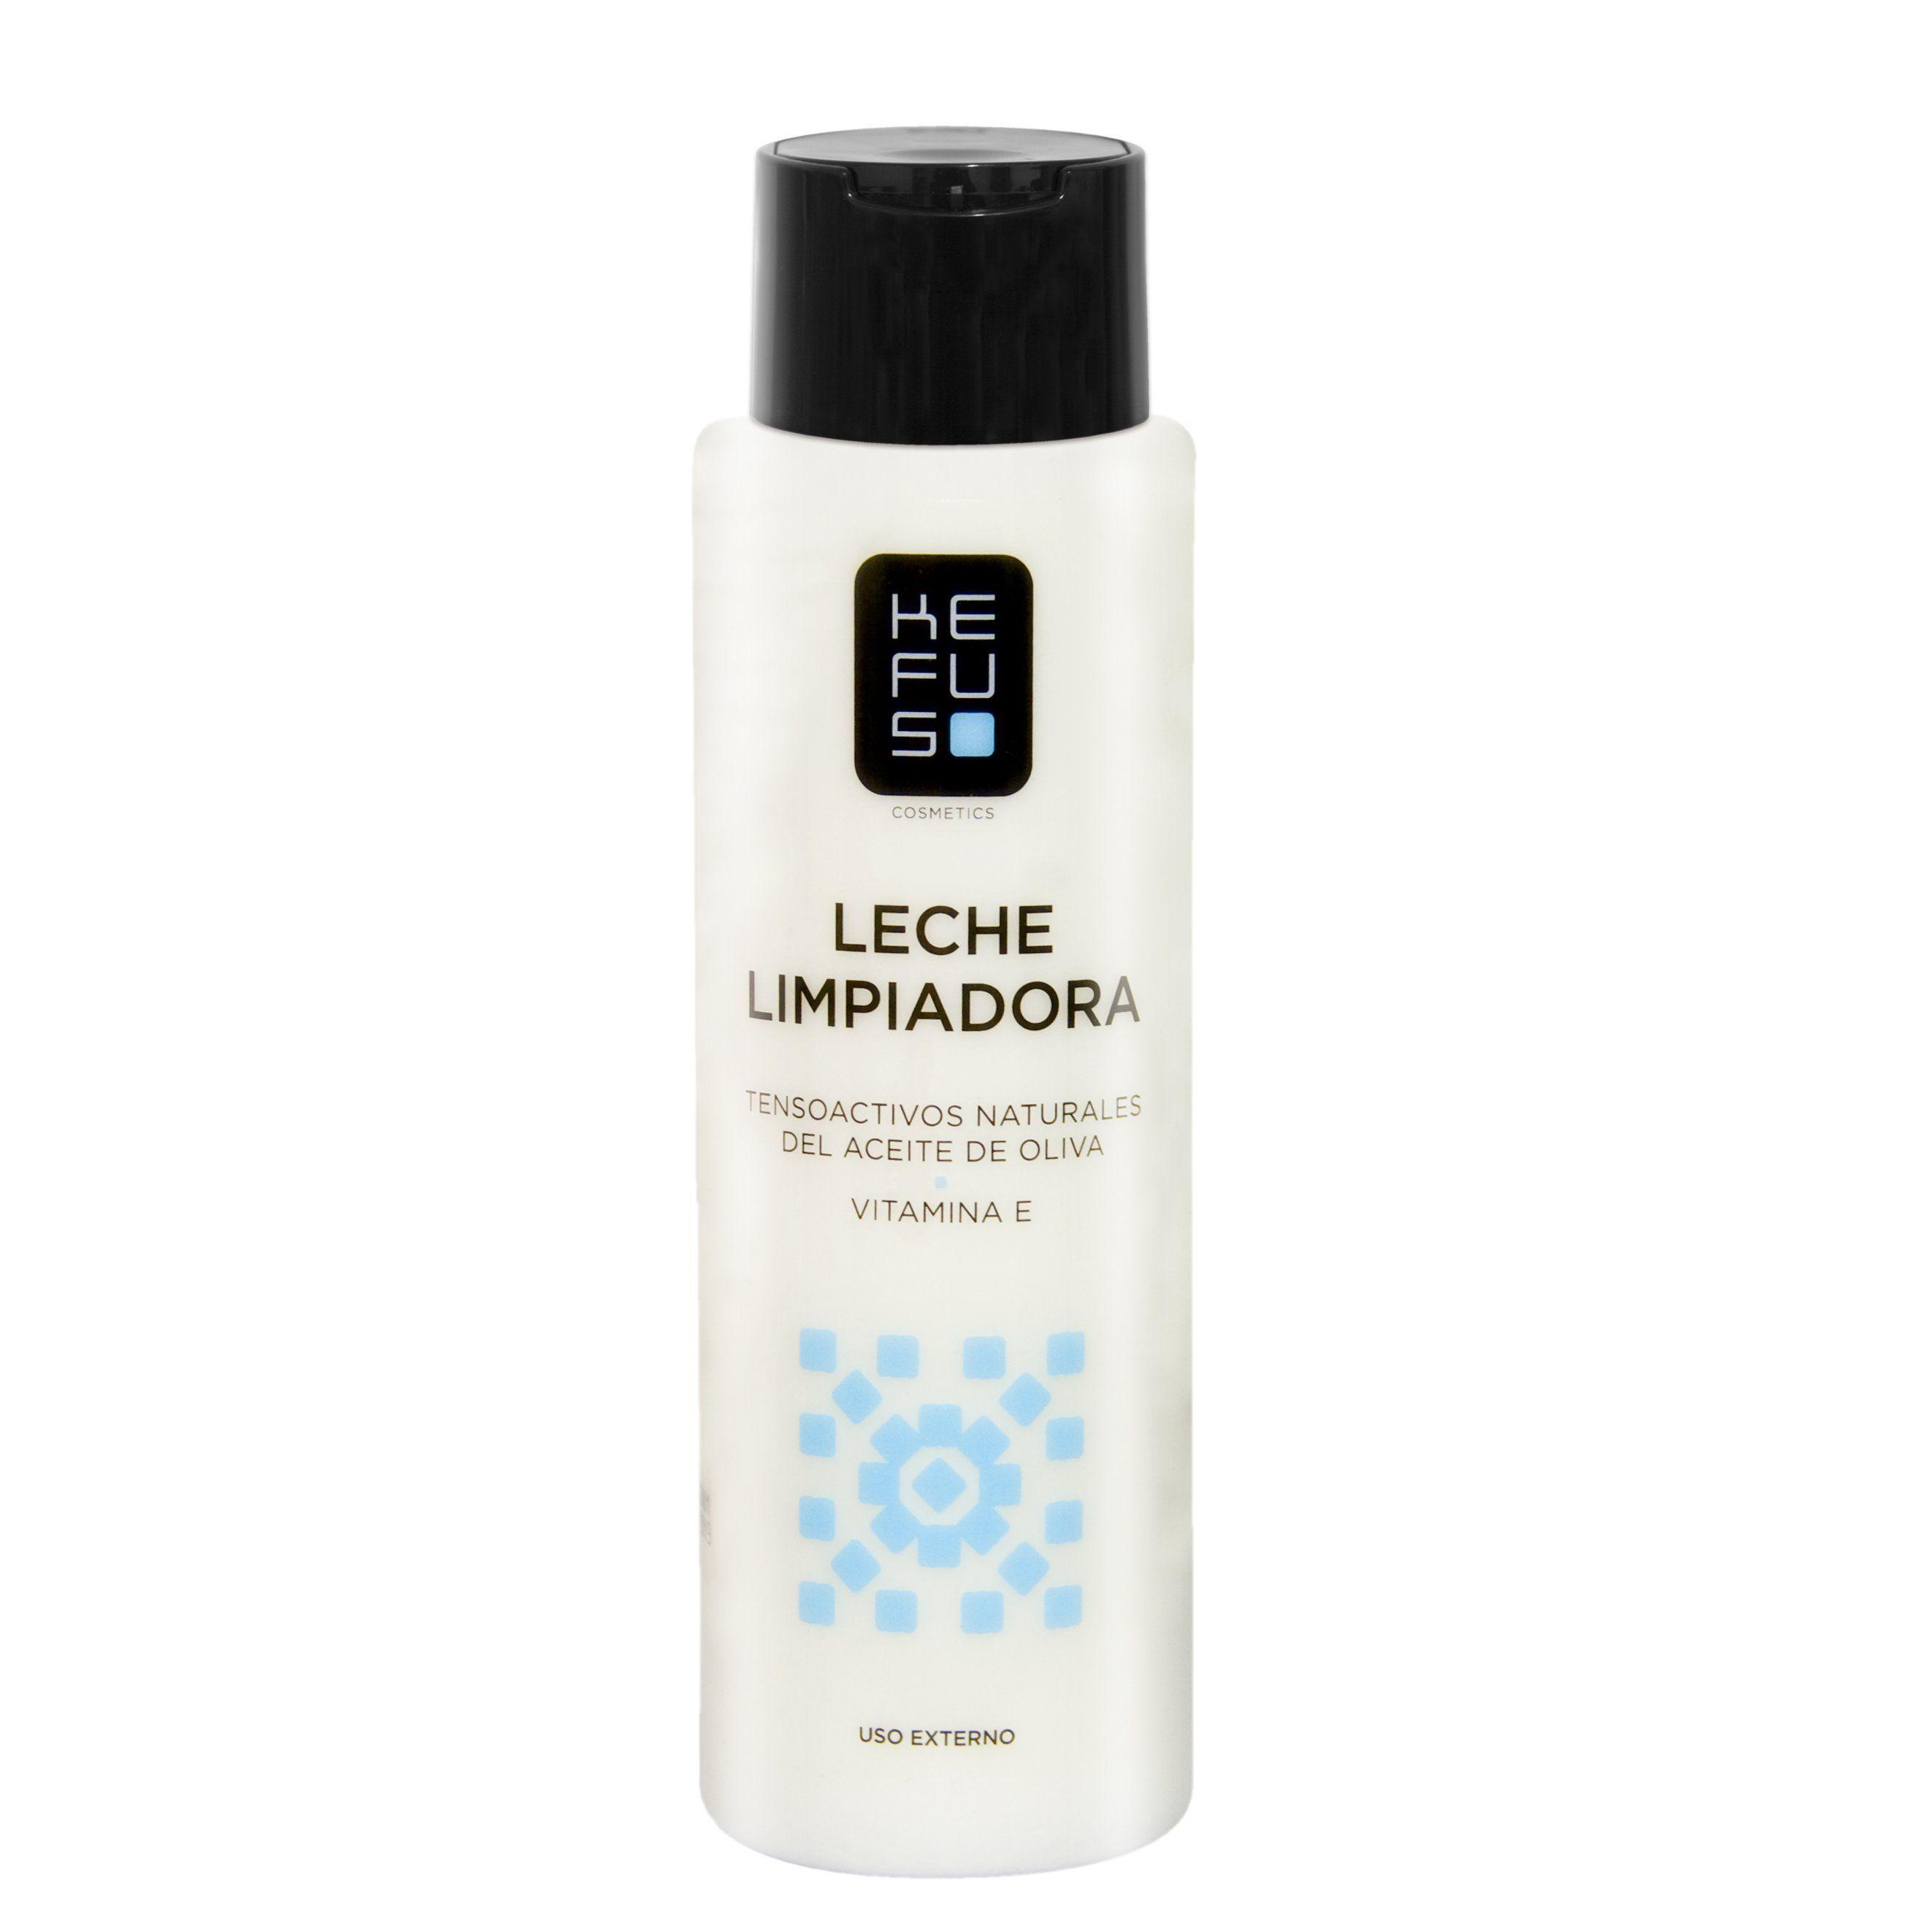 Leche limpiadora facial: Tienda online de Beldent